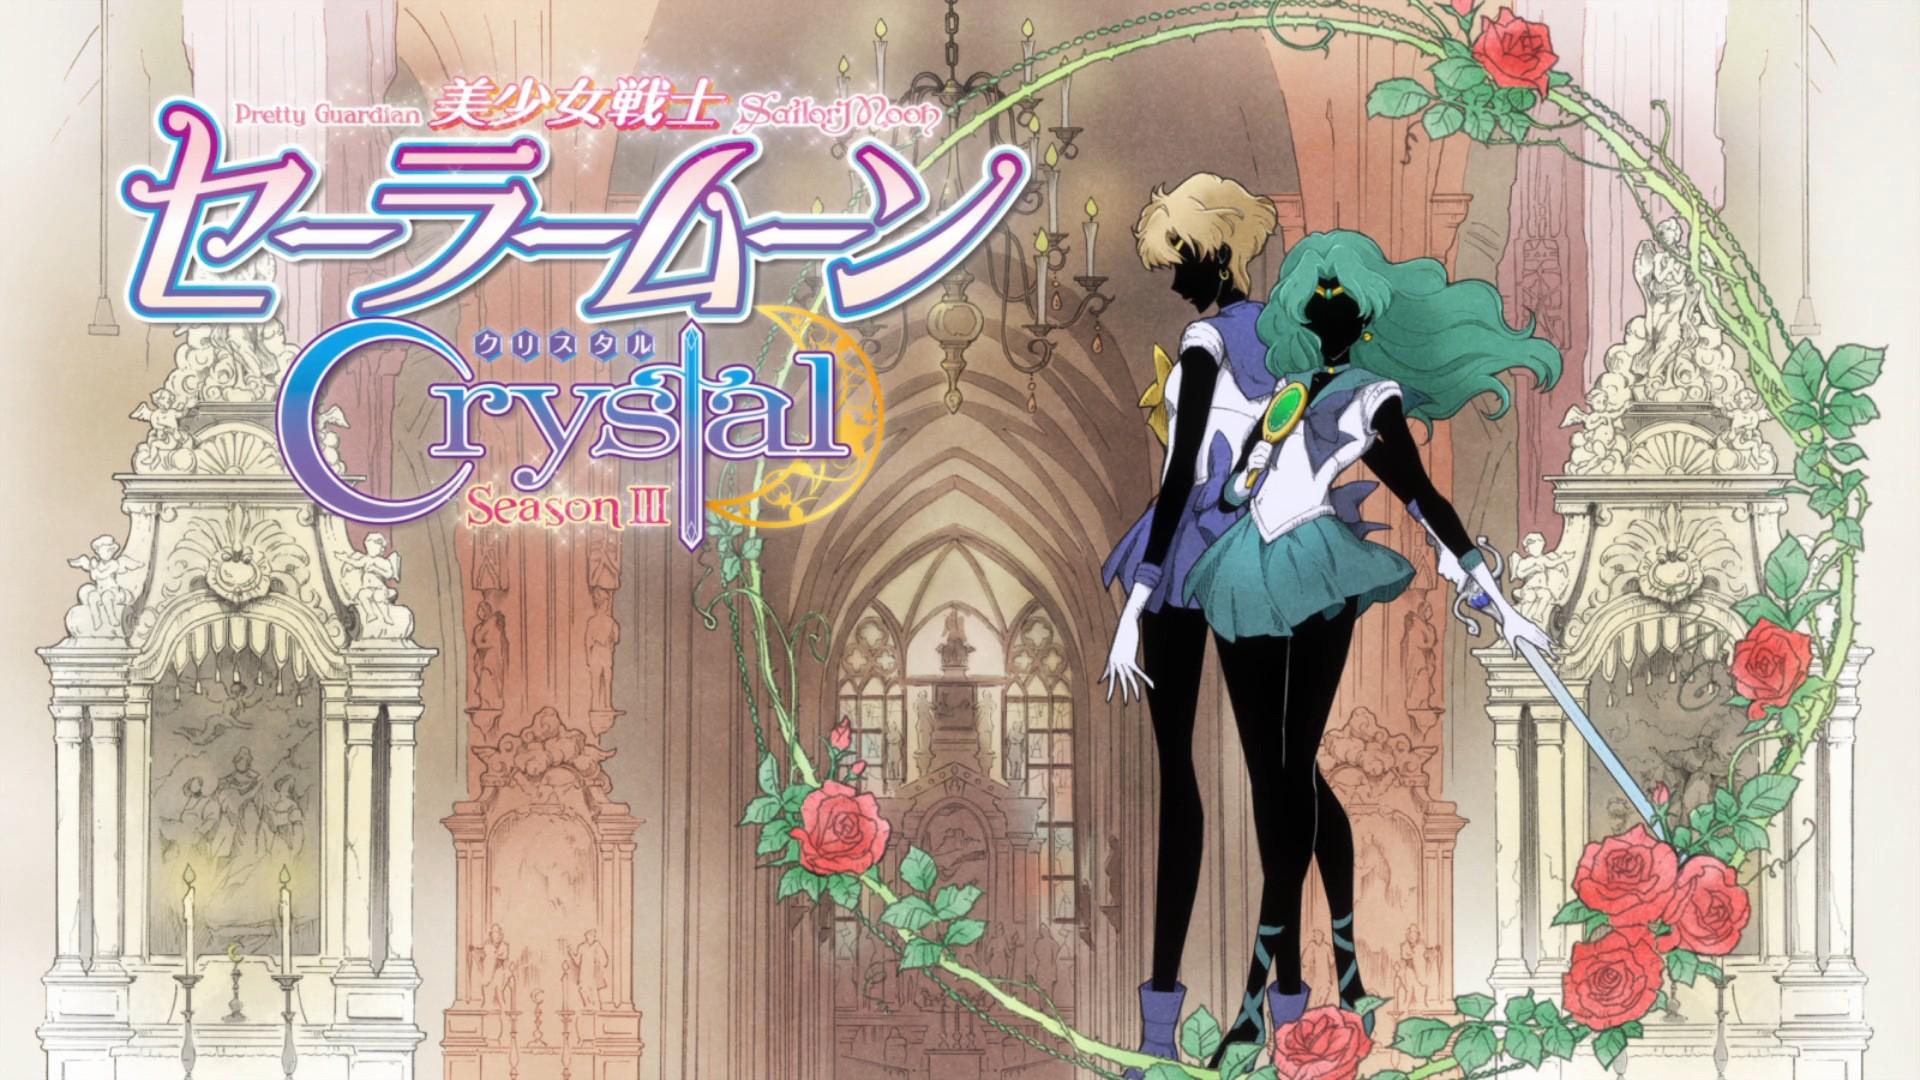 Sailor Moon Crystal season 3 Iphone wallpaper   Anime Iphone .